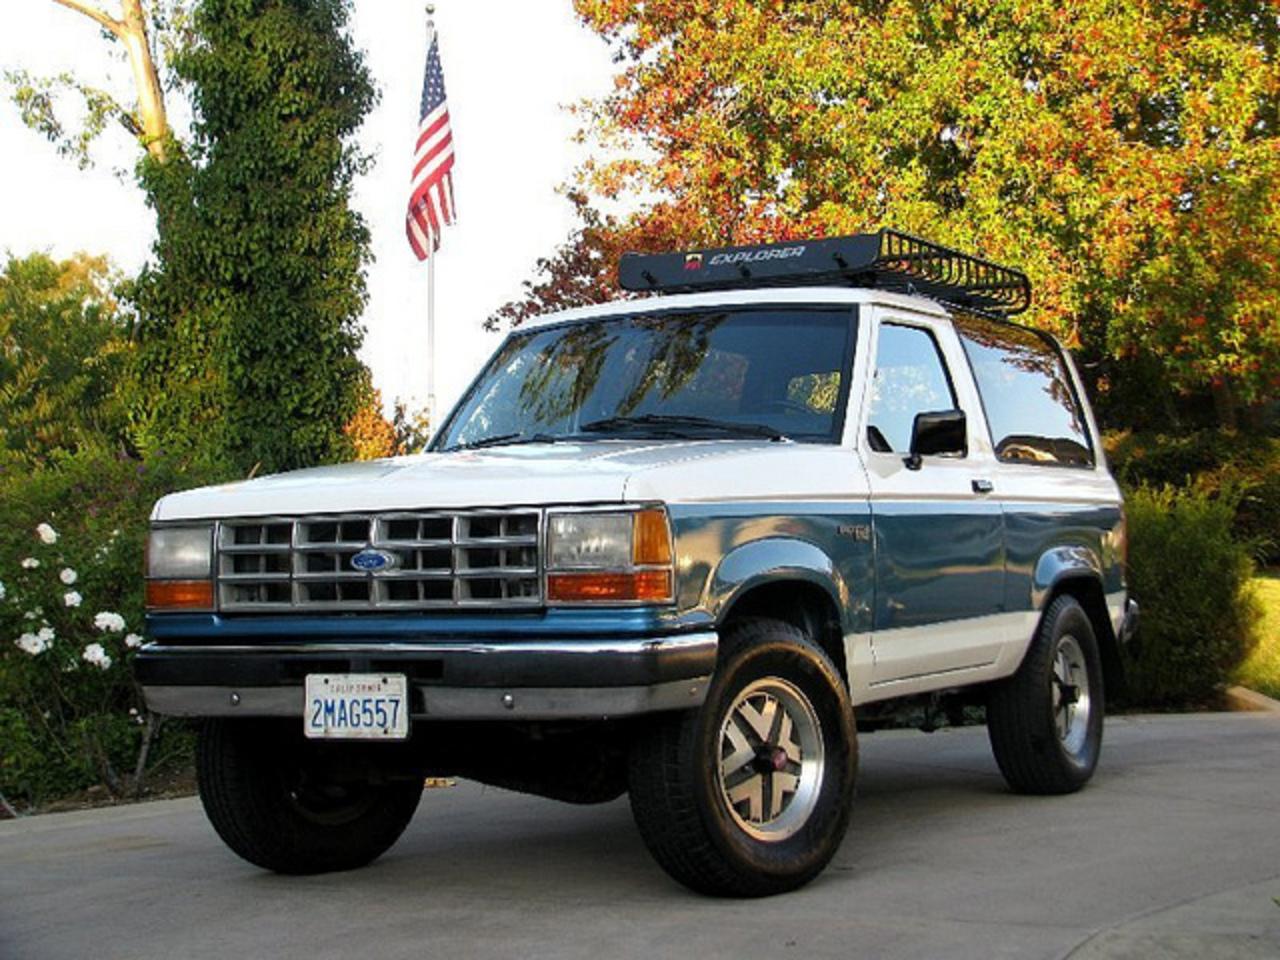 Topworldauto Gt Gt Photos Of Ford Bronco Ii 4x4 Photo Galleries